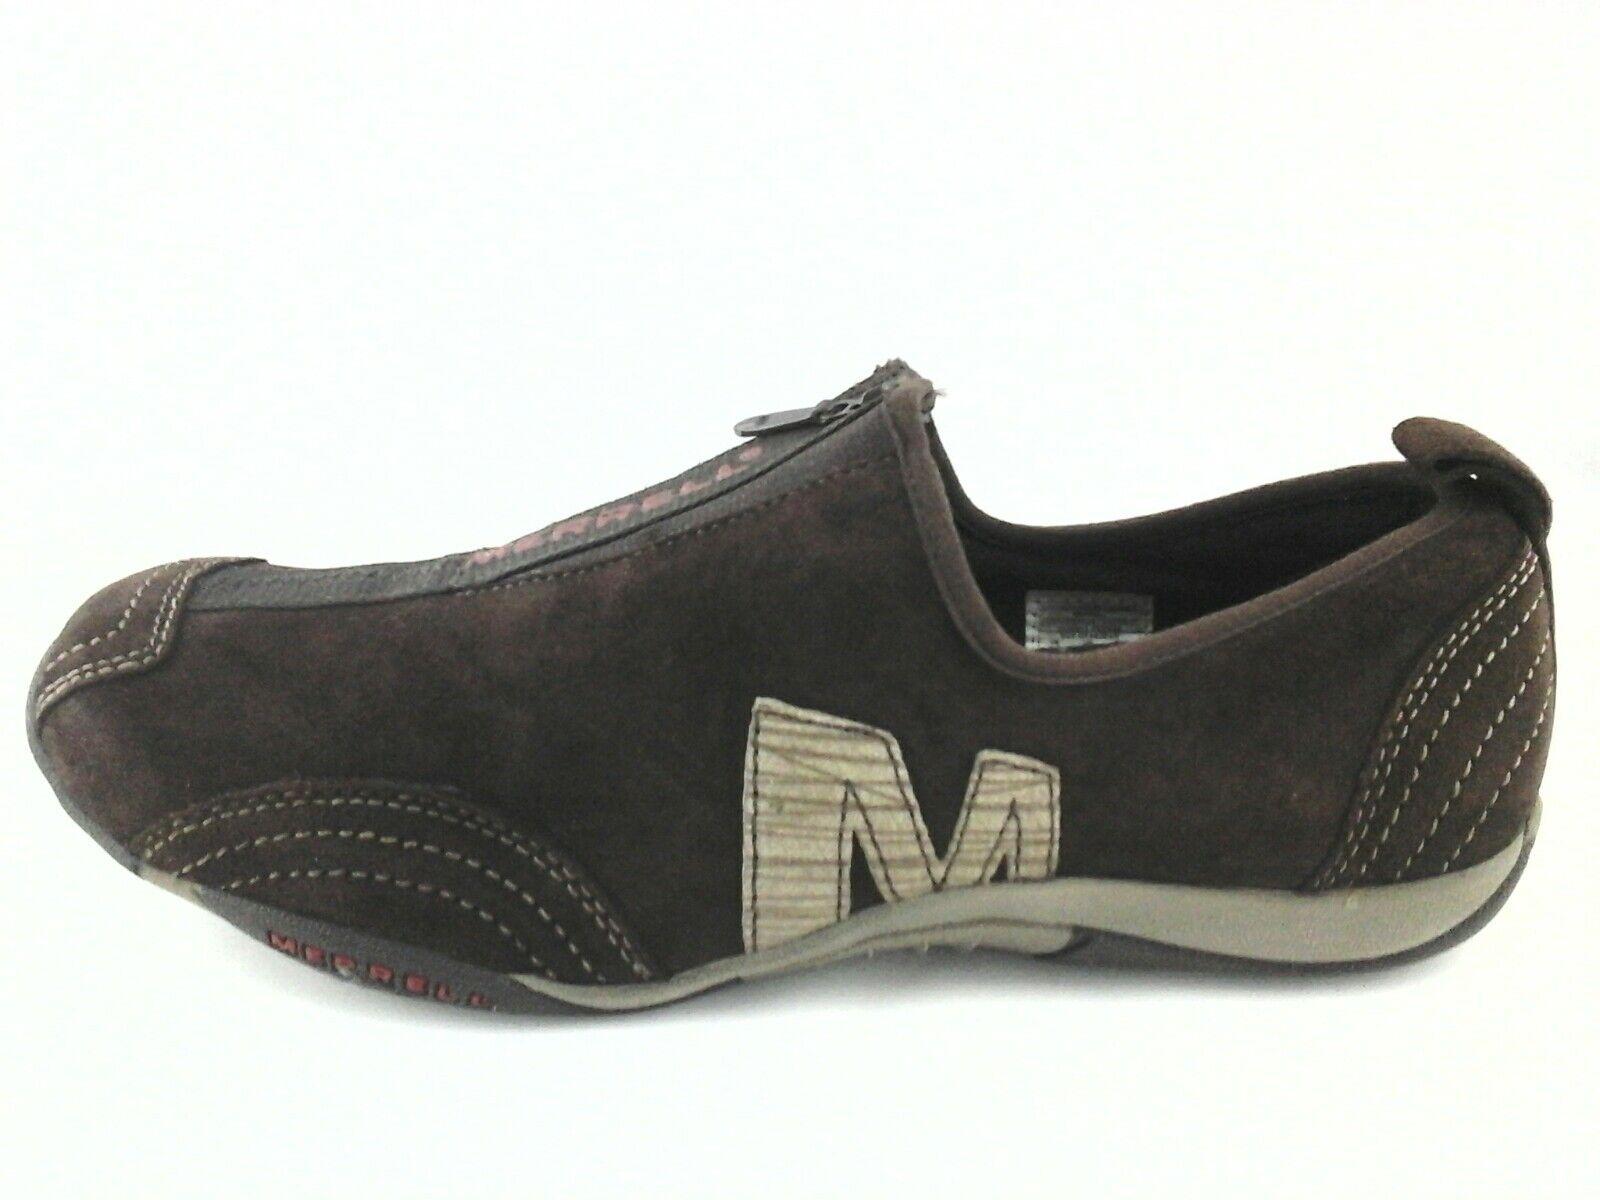 MERRELL Sneakers  Chaussures  BARRADO Brown Suede Zip Casual femmes  US 8.5 EU 39  79